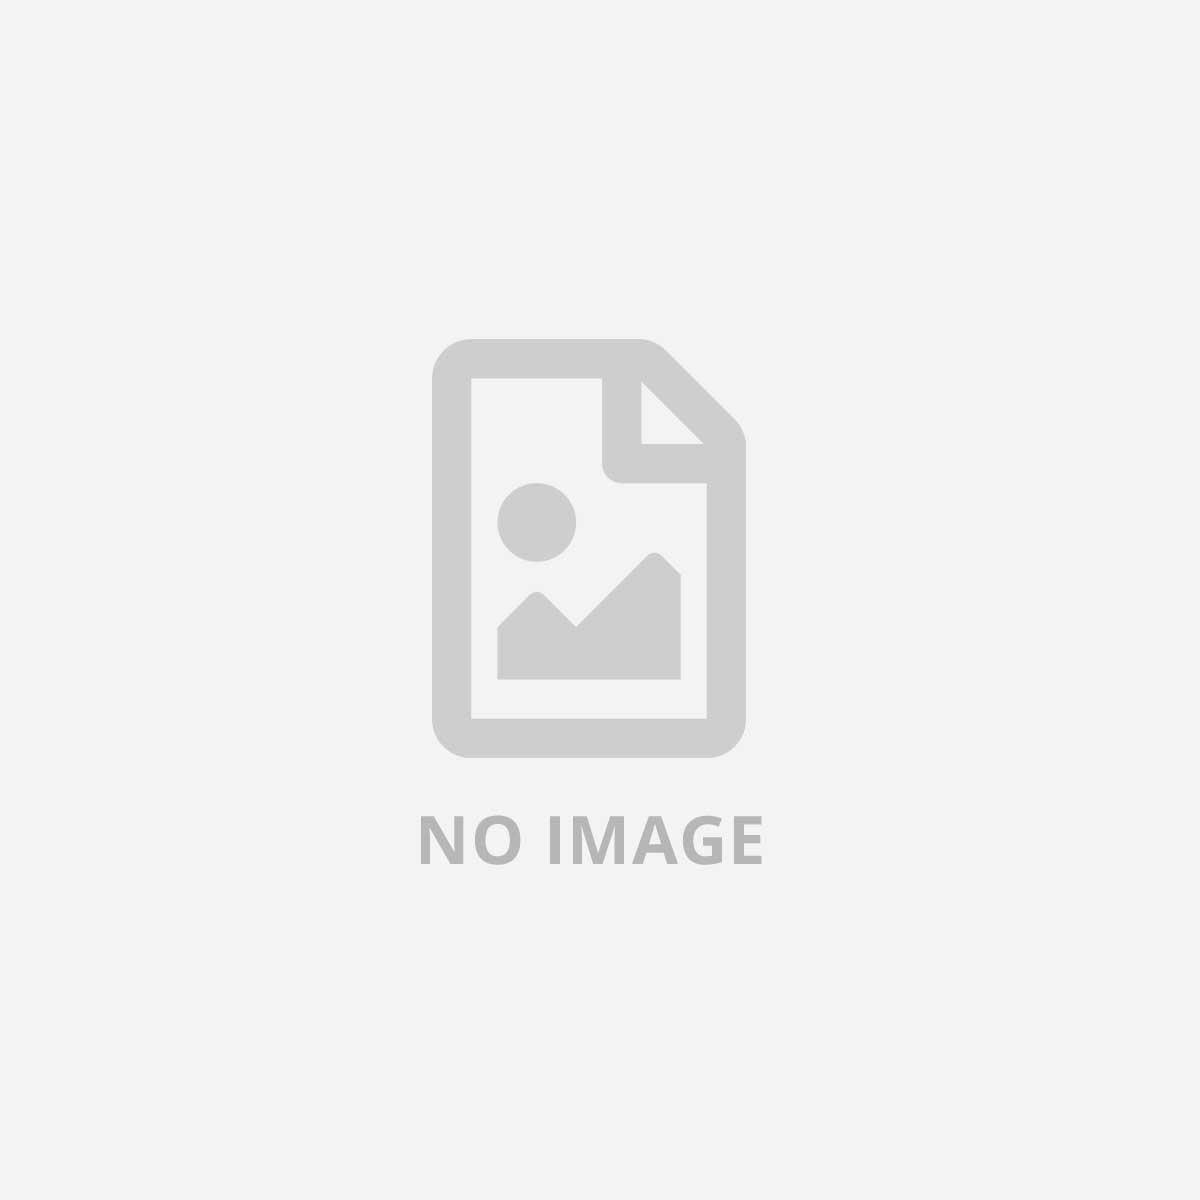 NILOX LETTORE SMART CARD USB 2.0